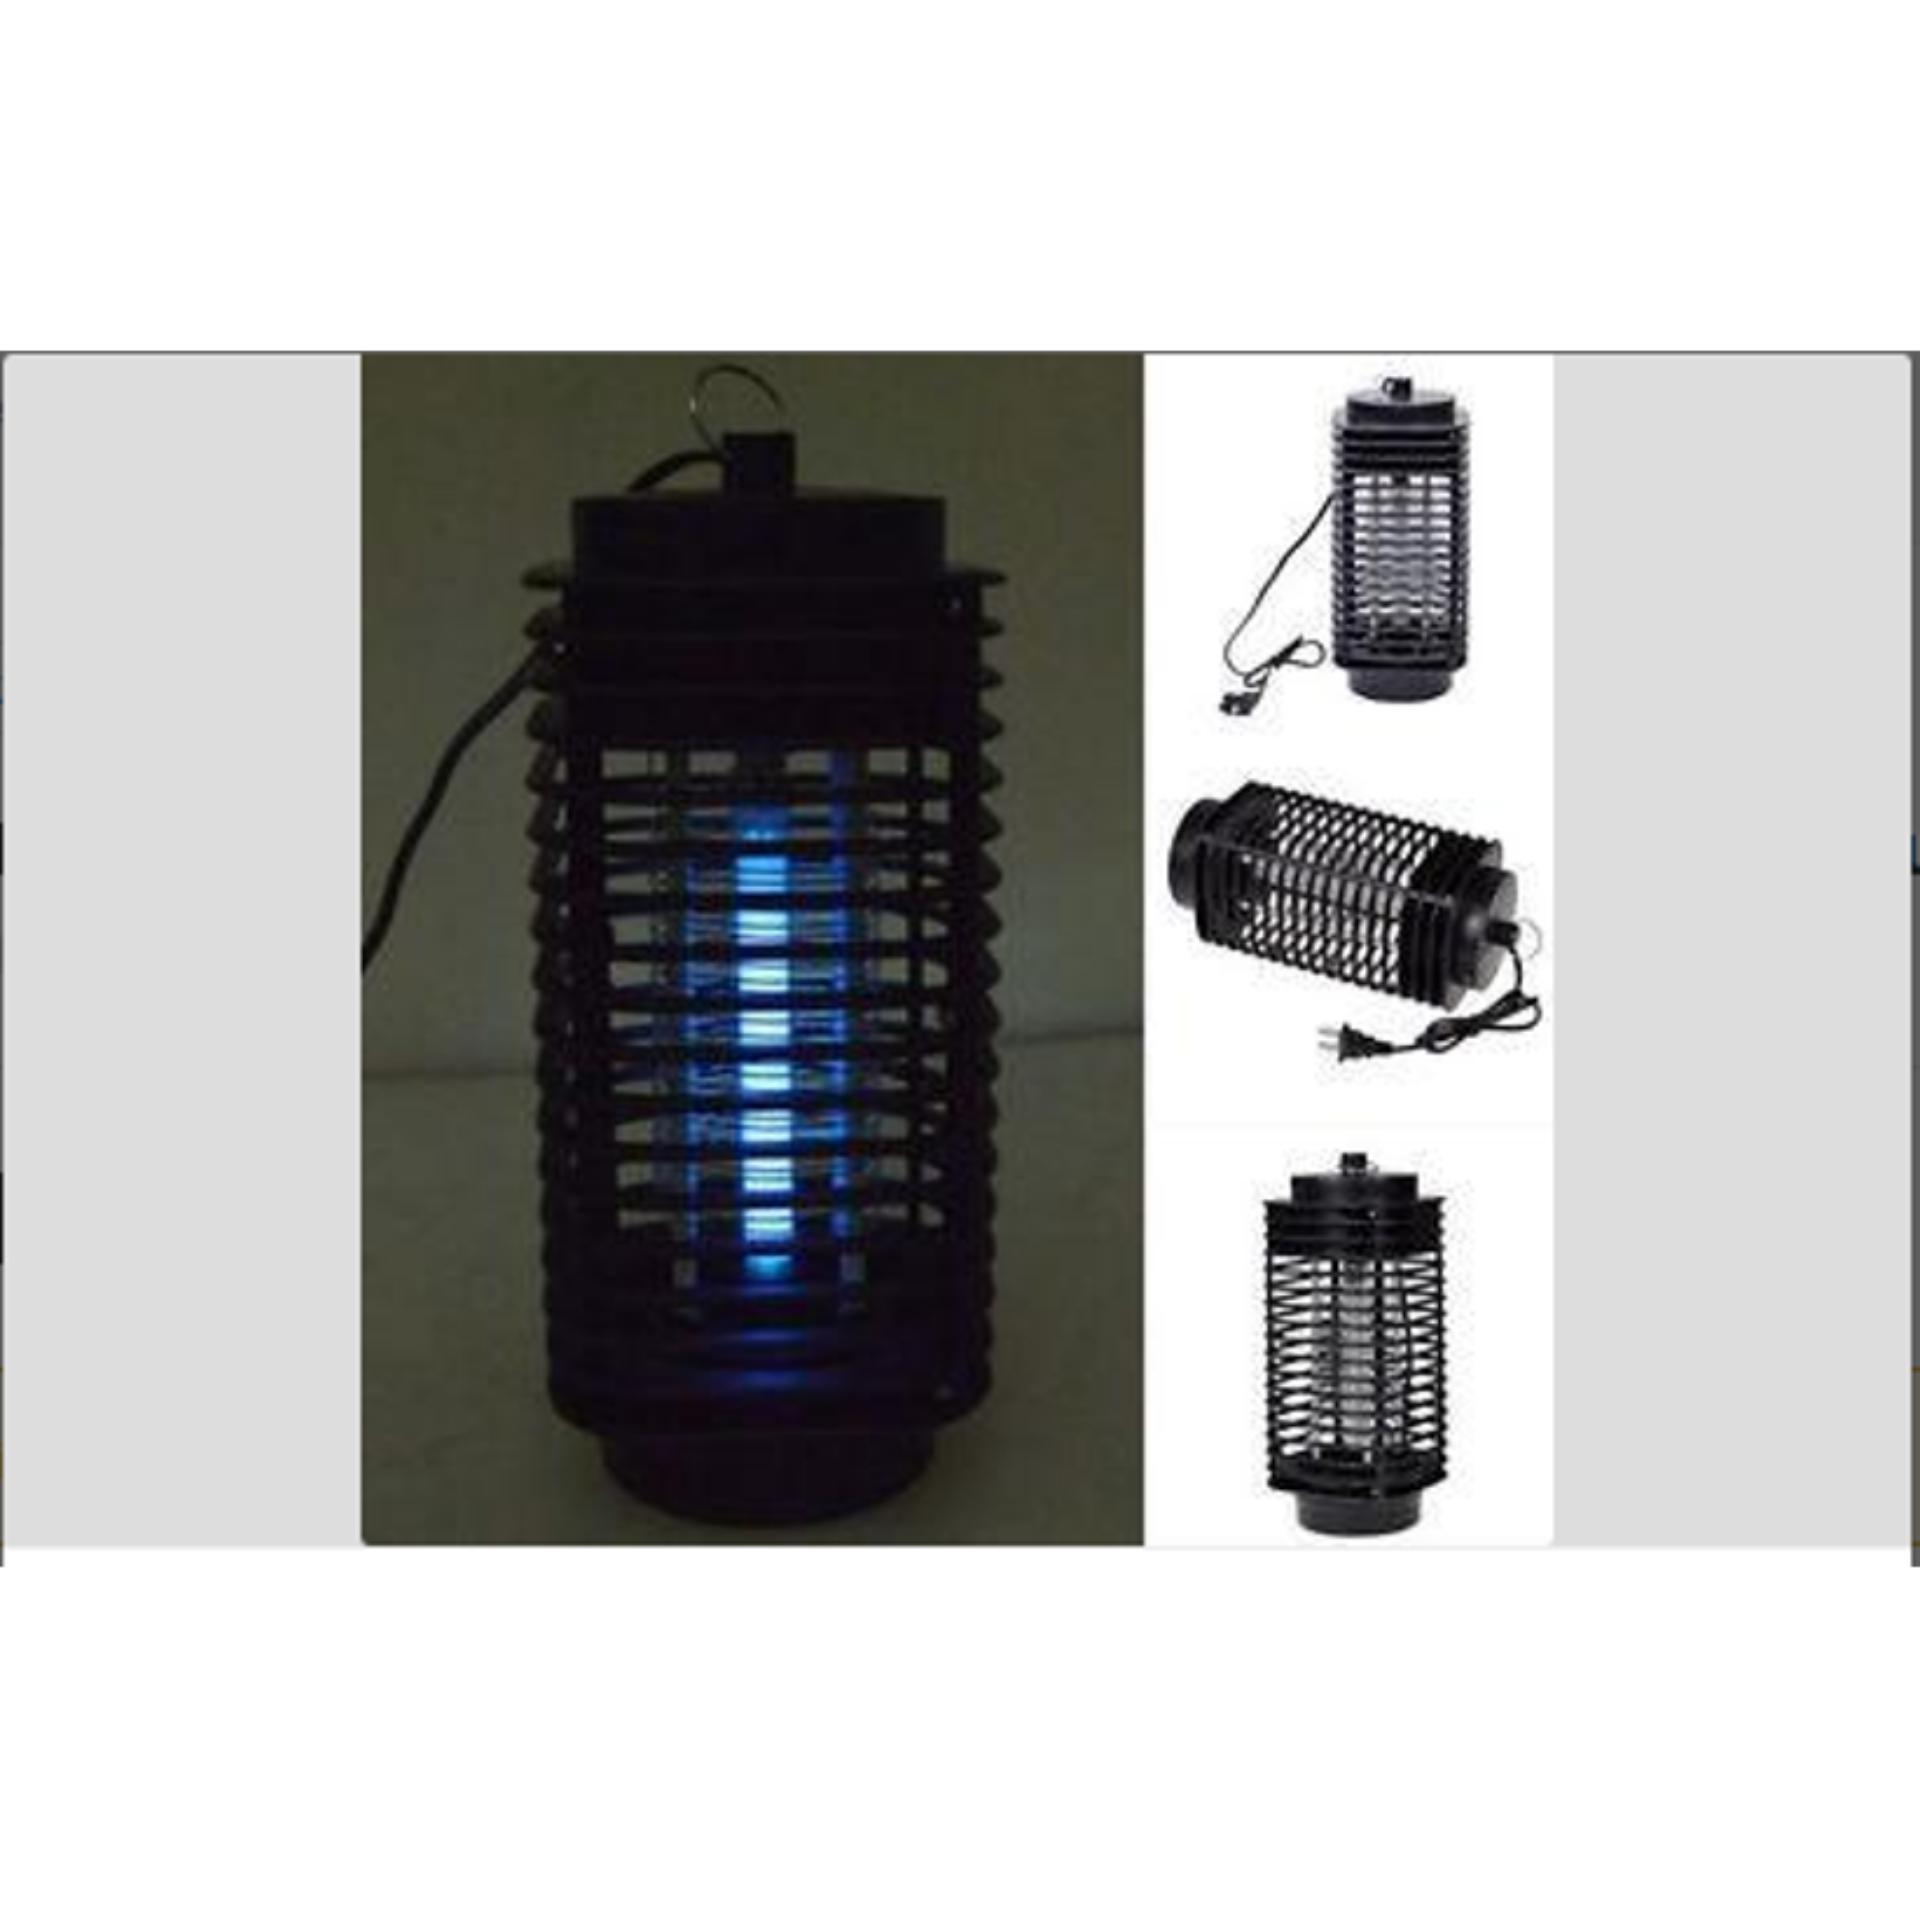 Promoo Electric Mosquito Killer Perangkap Nyamuk Lampu Anti Mediatech Uv Biru 69953 Antinyamuk